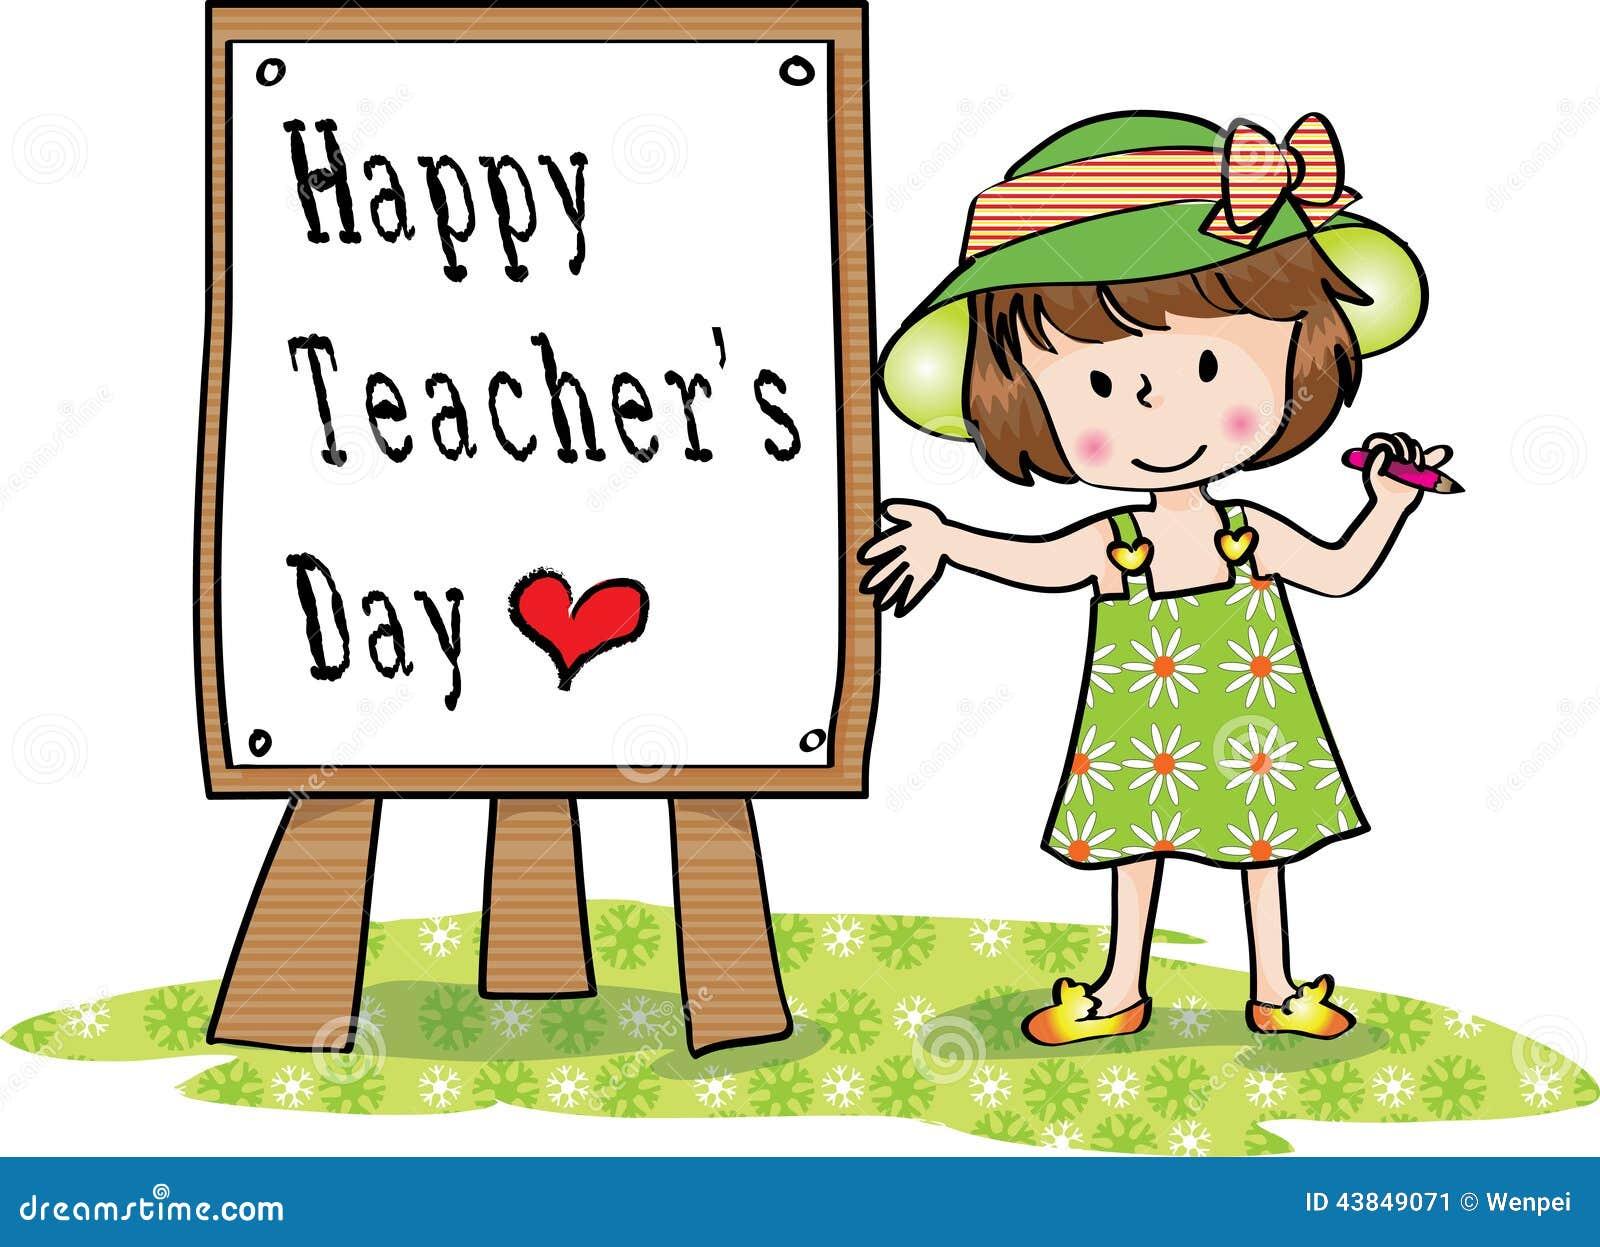 clipart for teachers day - photo #25